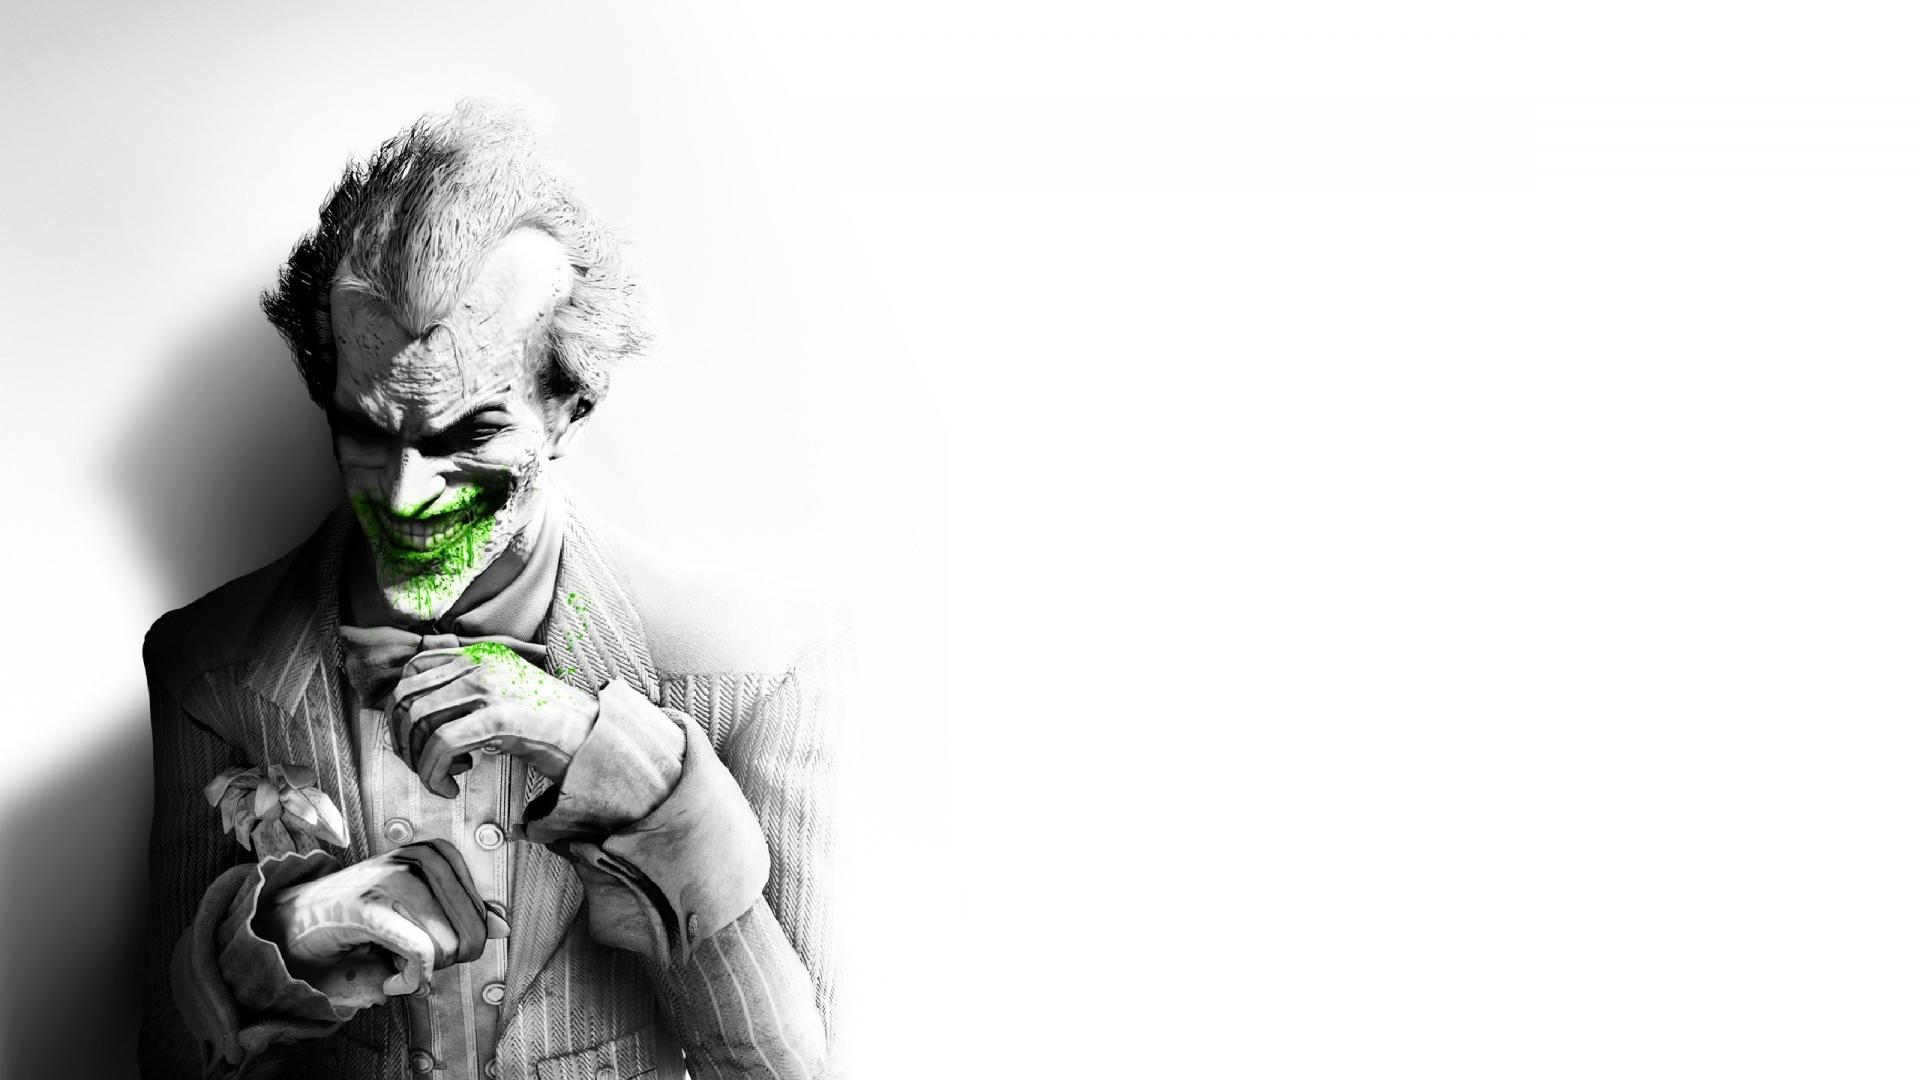 Download Wallpaper 1920x1080 Batman Arkham City Joker Smile